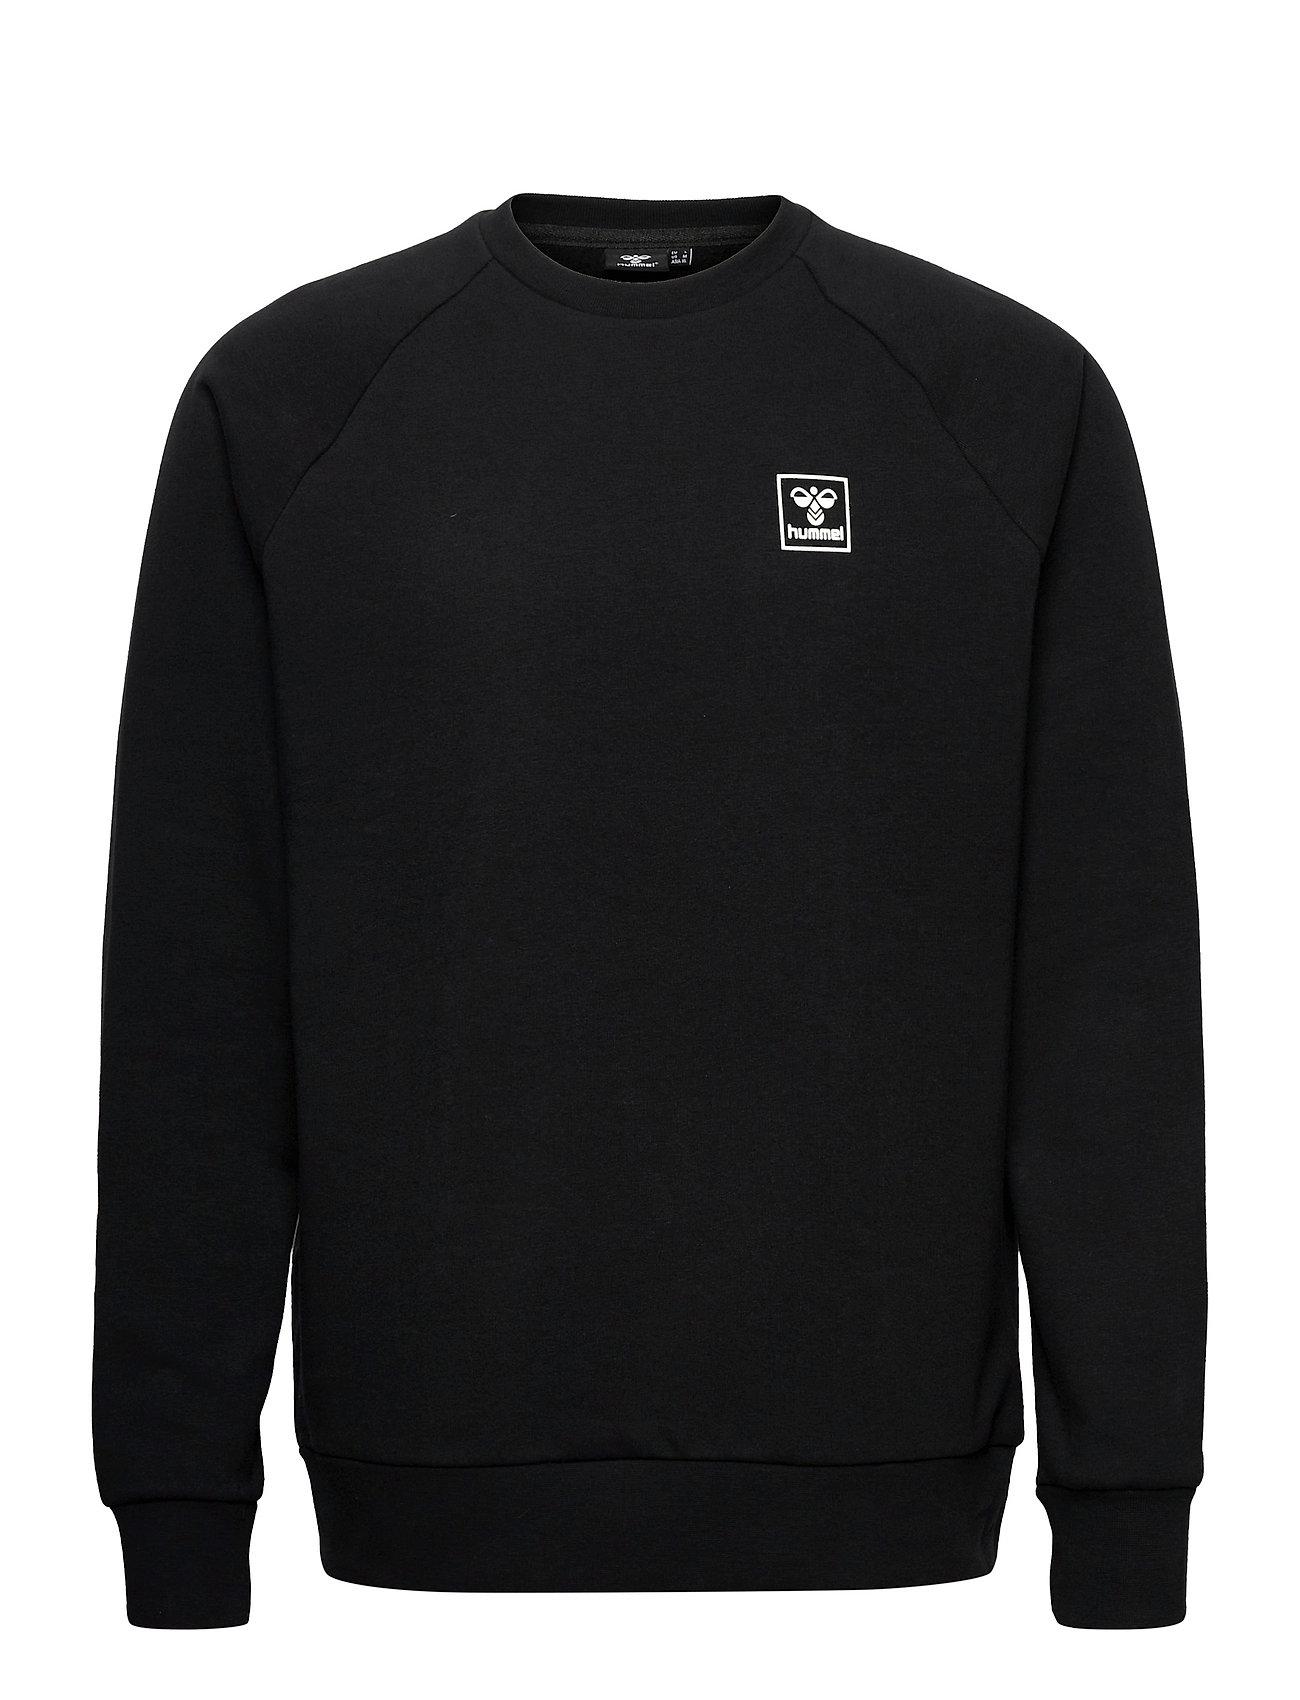 Hmlisam Sweatshirt Sweatshirt Trøje Sort Hummel